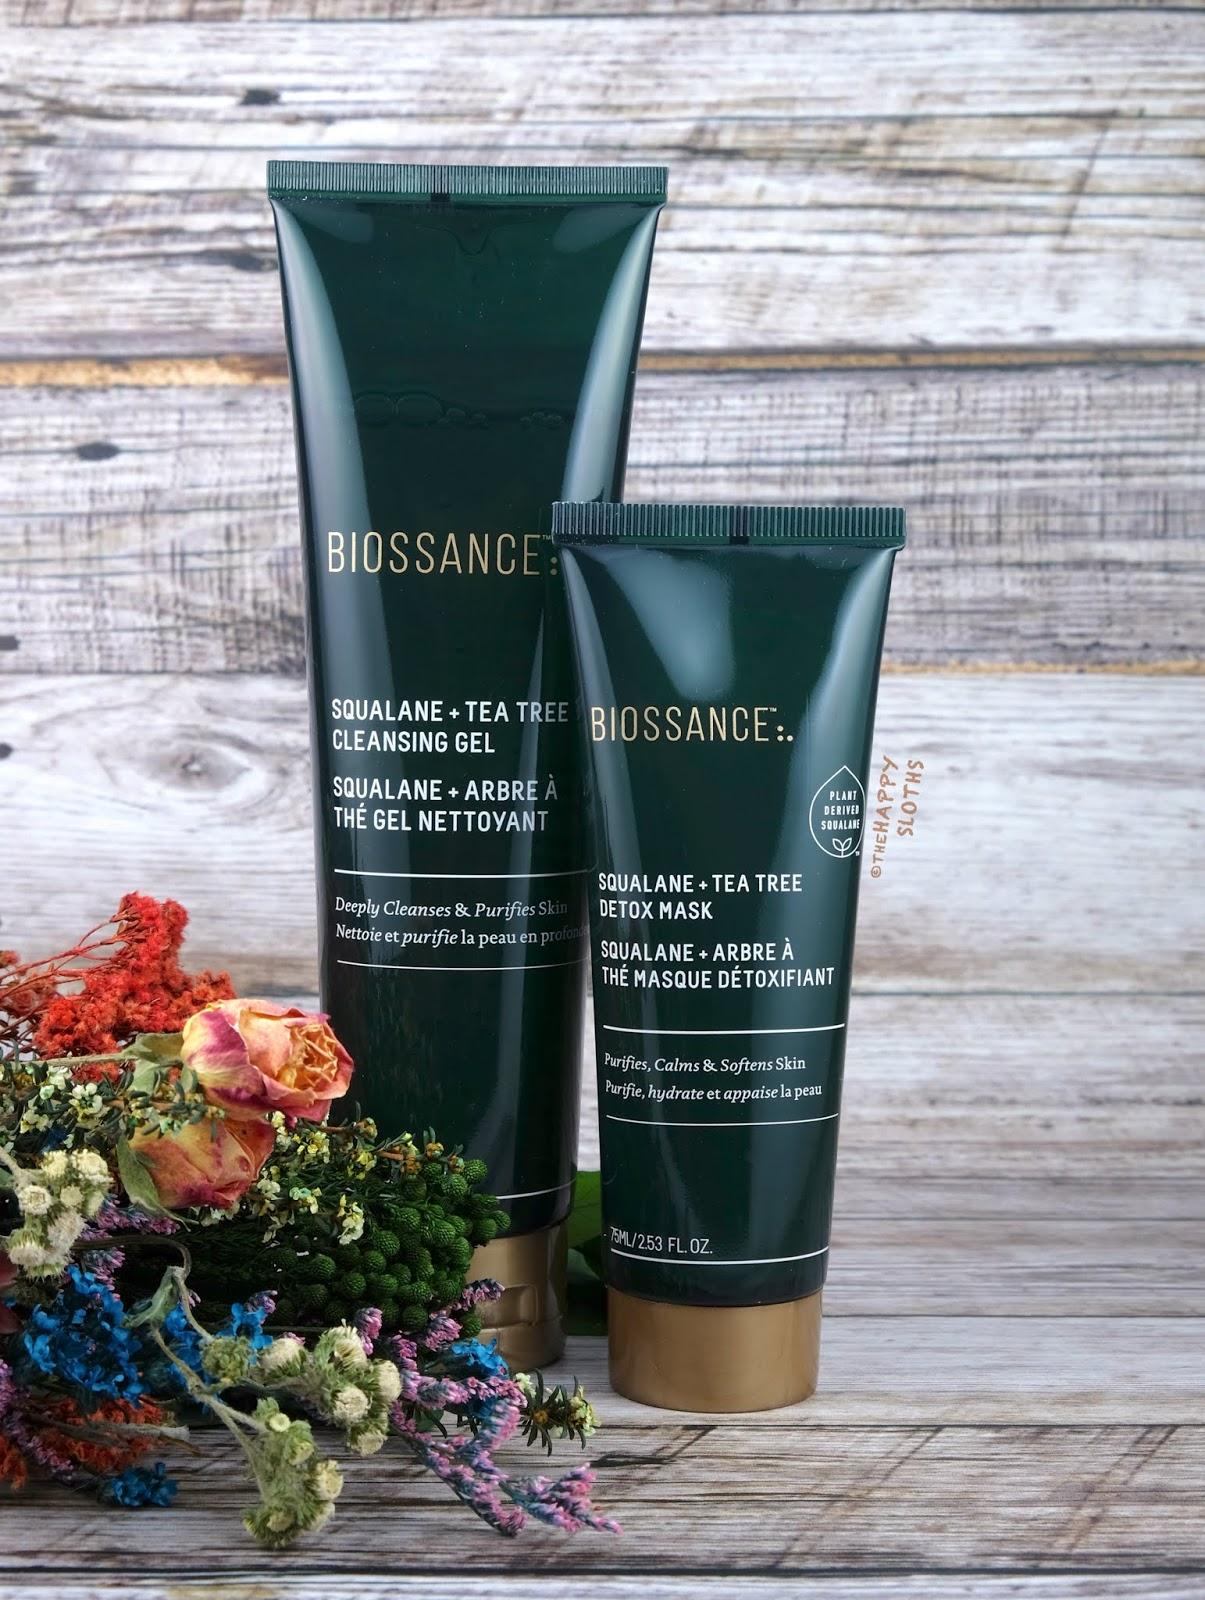 Biossance   Squalane + Tea Tree Cleansing Gel & Detox Mask: Review